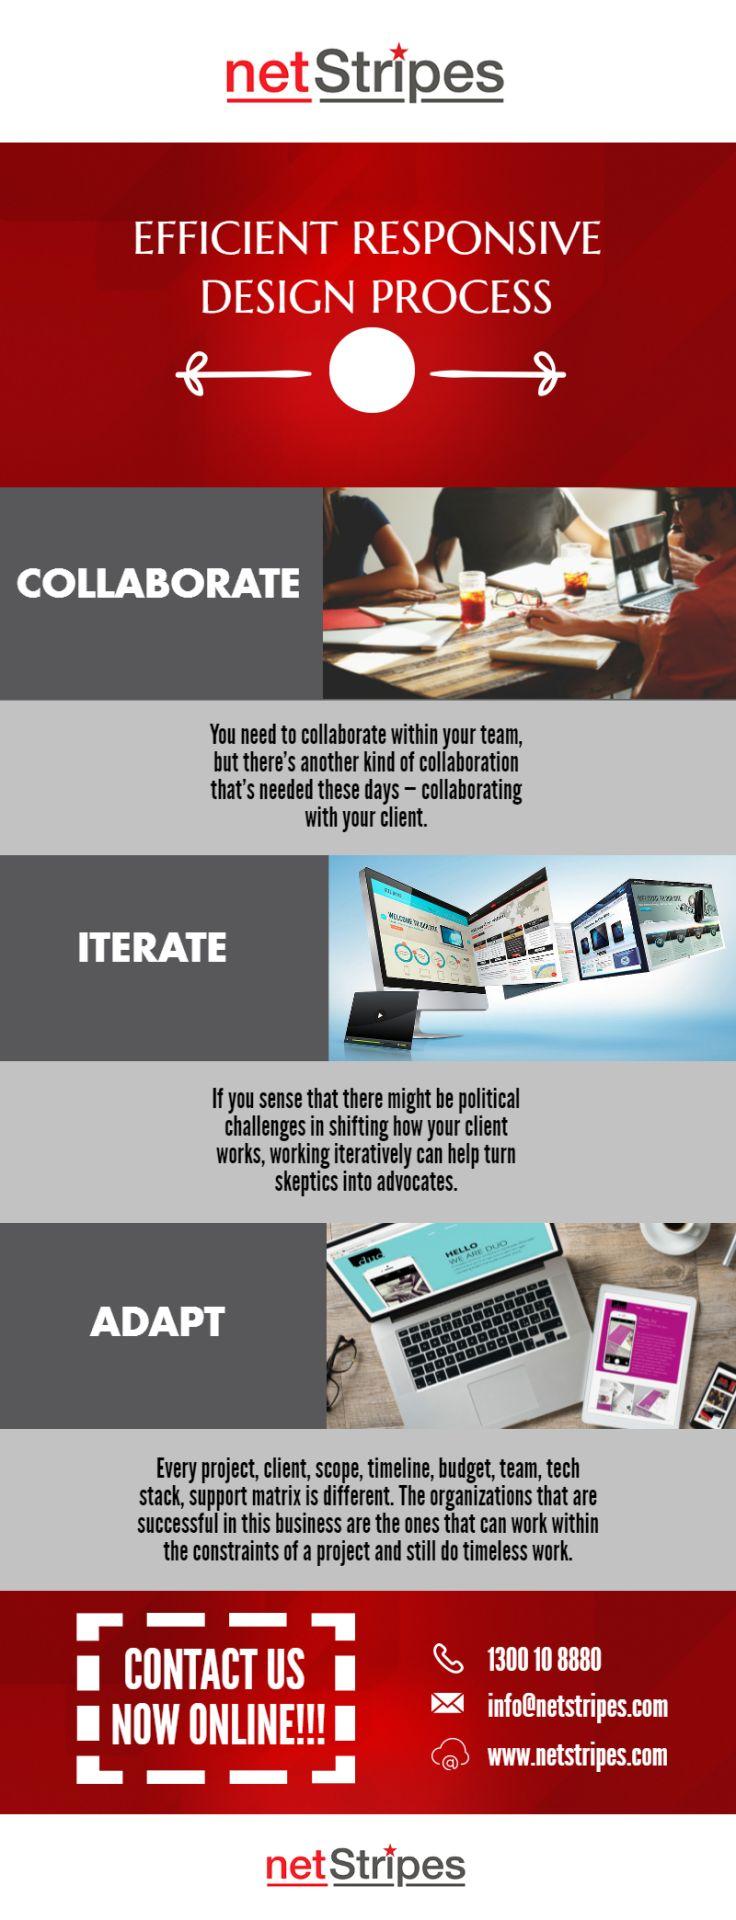 Efficient Responsive Design Process - Netstripes #WebDesignCompanySydney #AffordableWebSolutions #WebDevelopmentAgencySydney